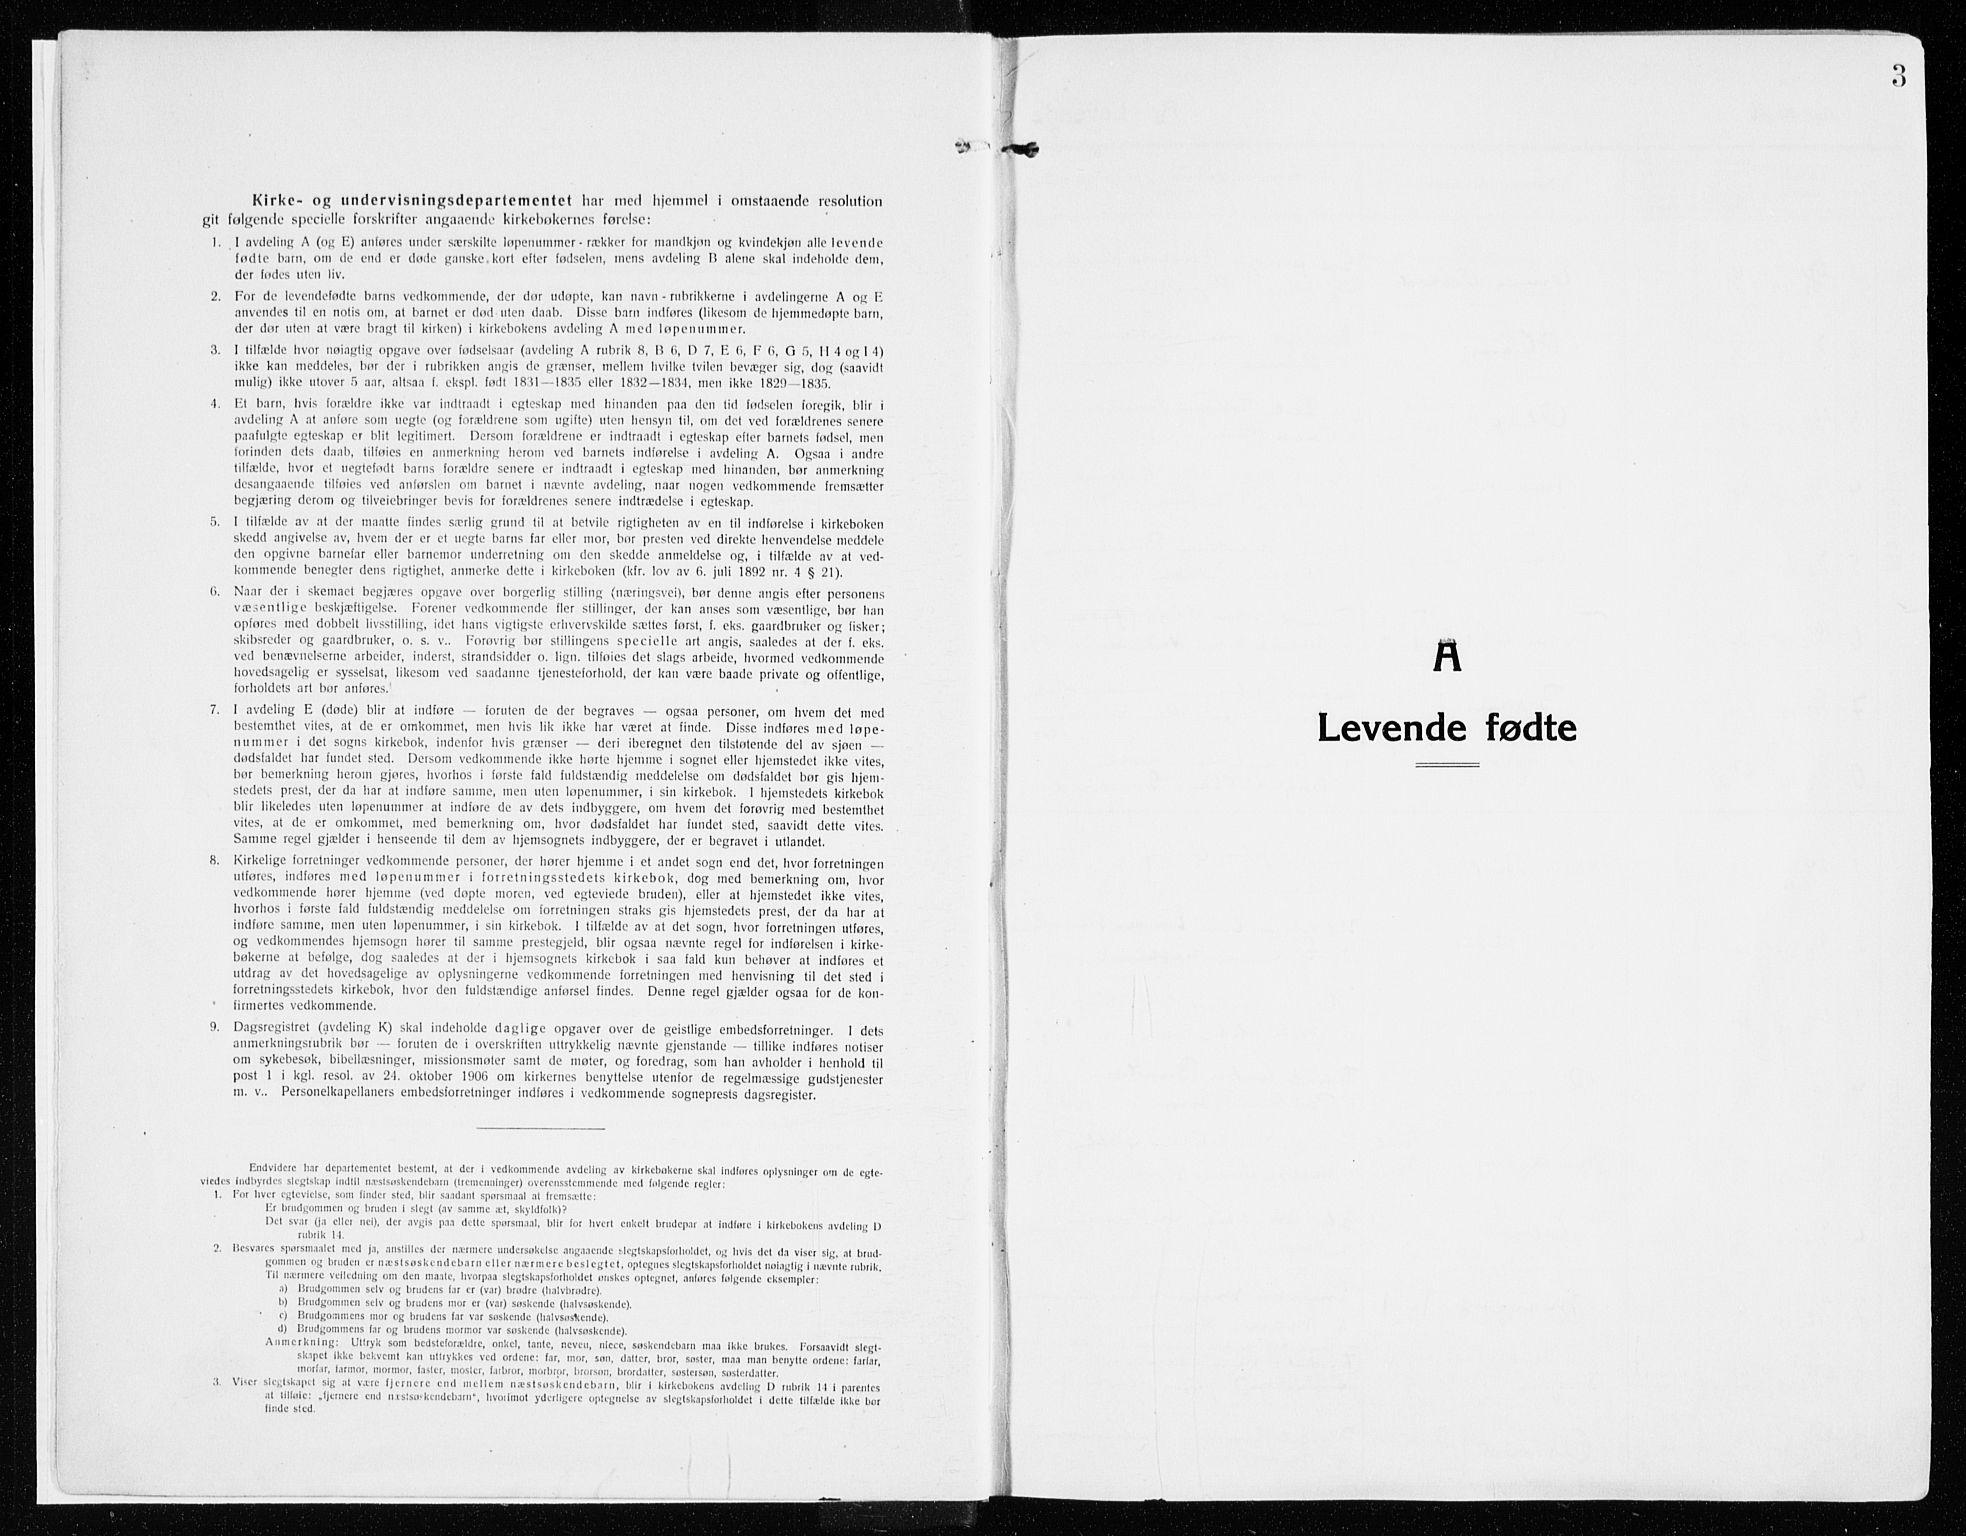 SAH, Vardal prestekontor, H/Ha/Haa/L0017: Ministerialbok nr. 17, 1915-1929, s. 3